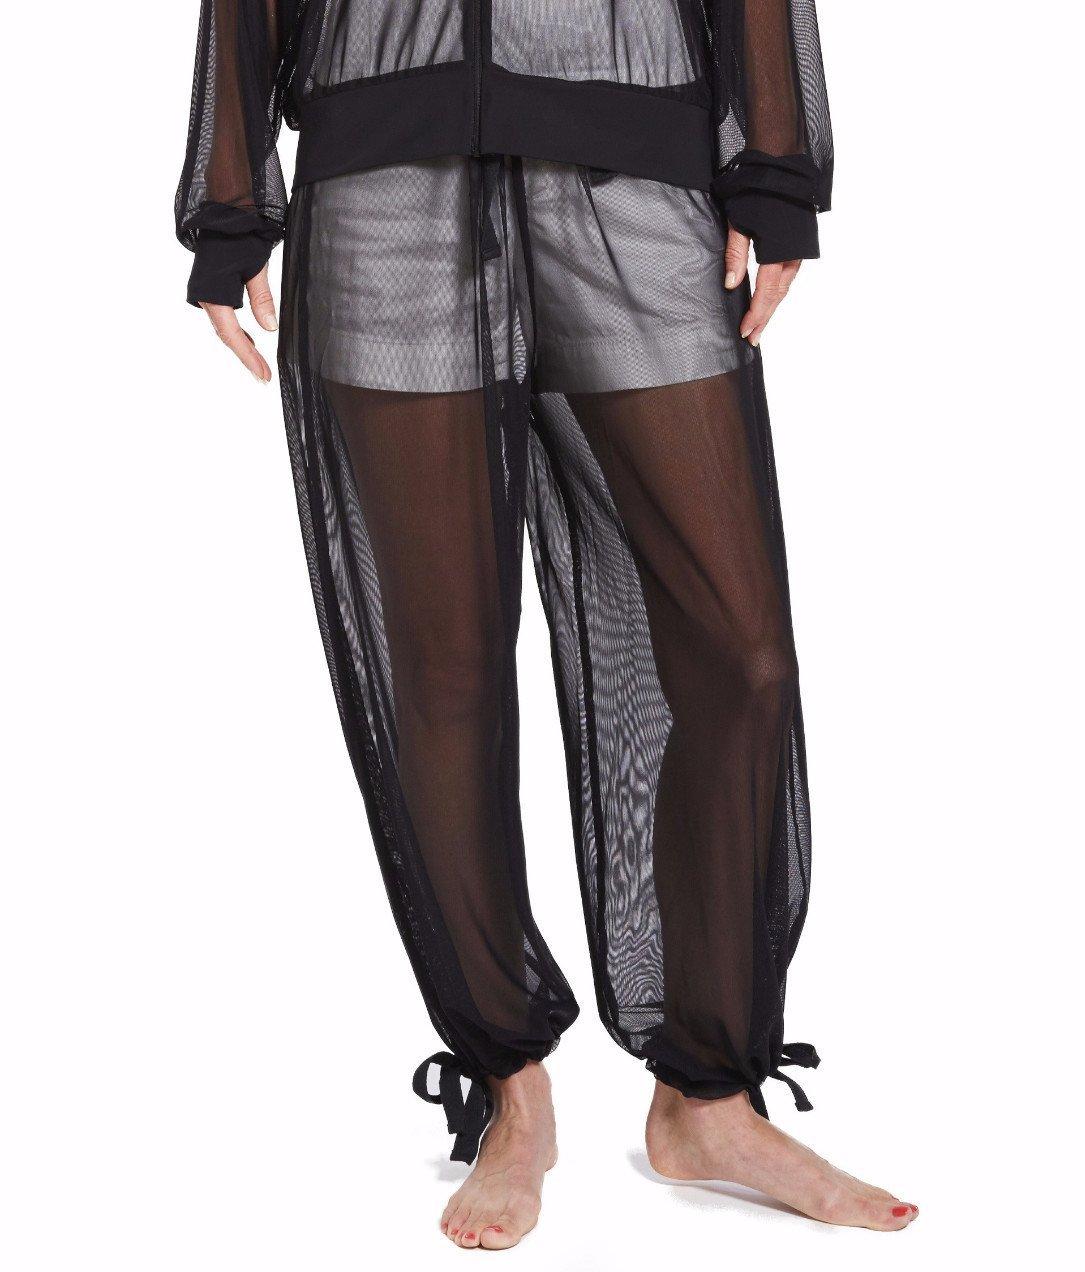 LIL&TESS Resort Mesh Ladies Track Pant (XS, Black)